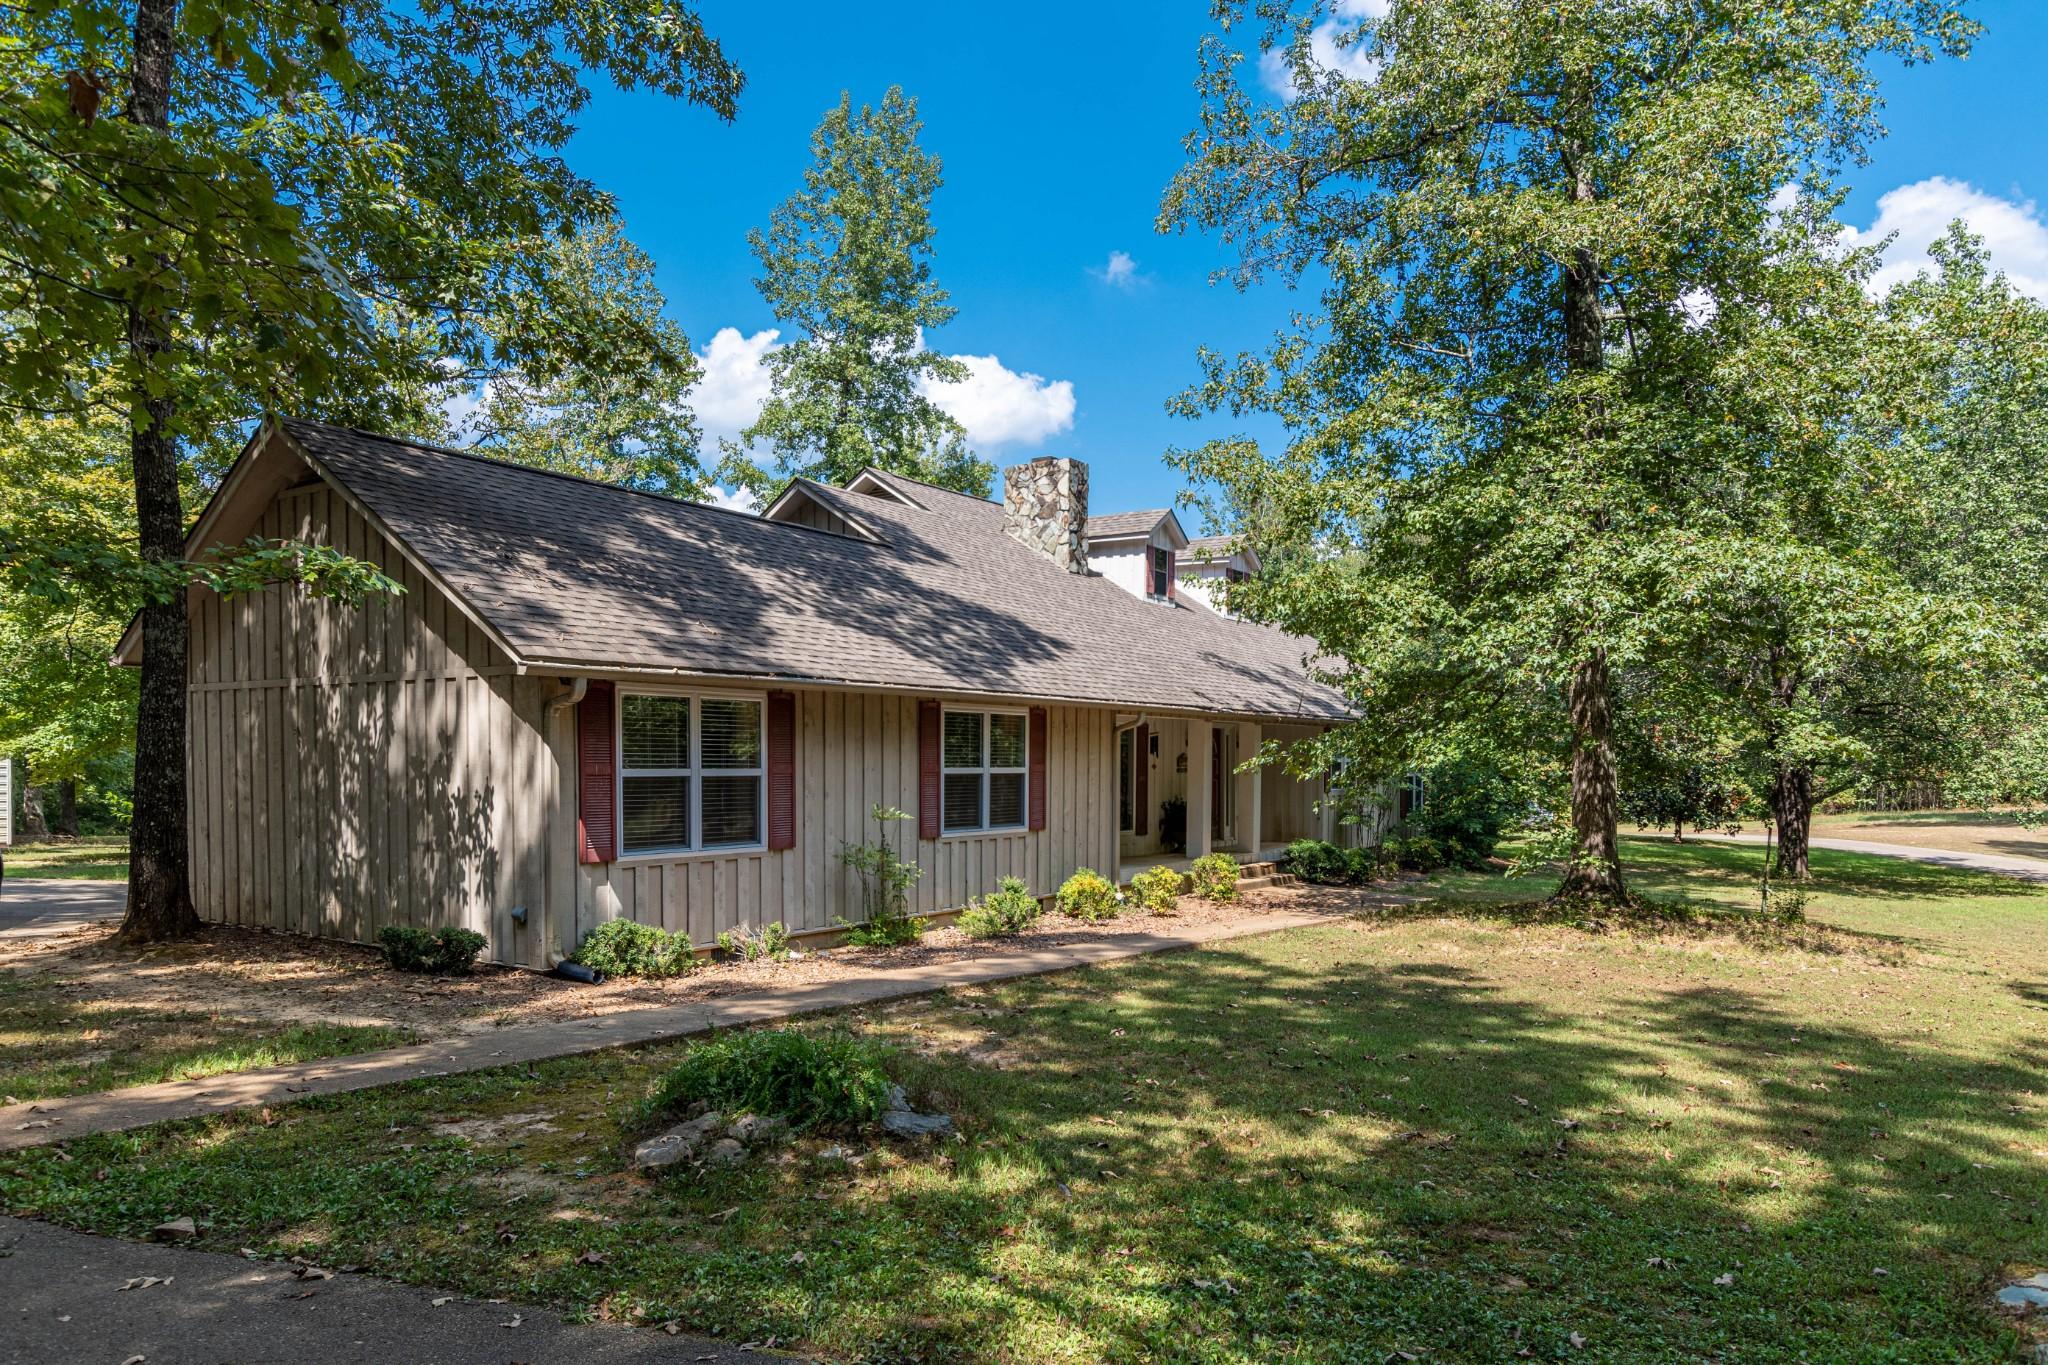 7383 Highway 641, N, Parsons, TN 38363 - Parsons, TN real estate listing